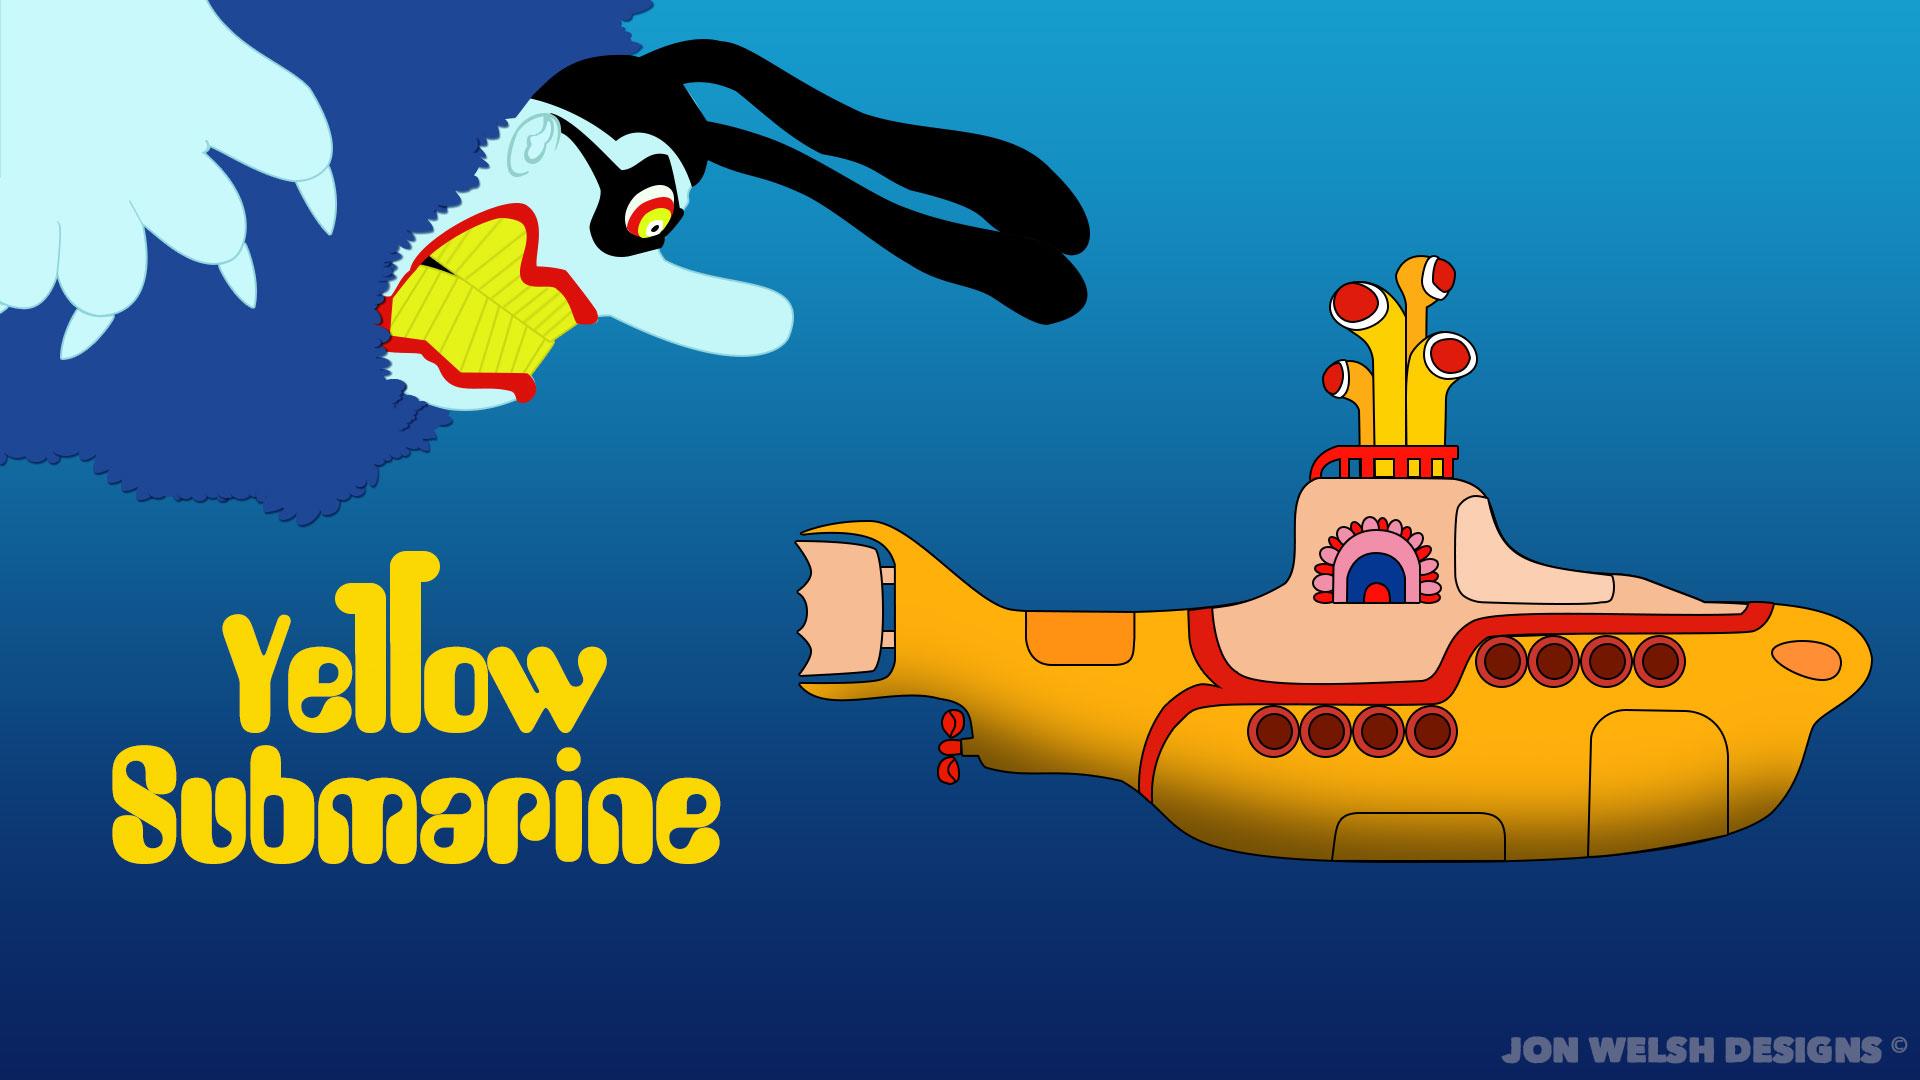 Beatles Yellow Submarine Wallpaper 1920x1080